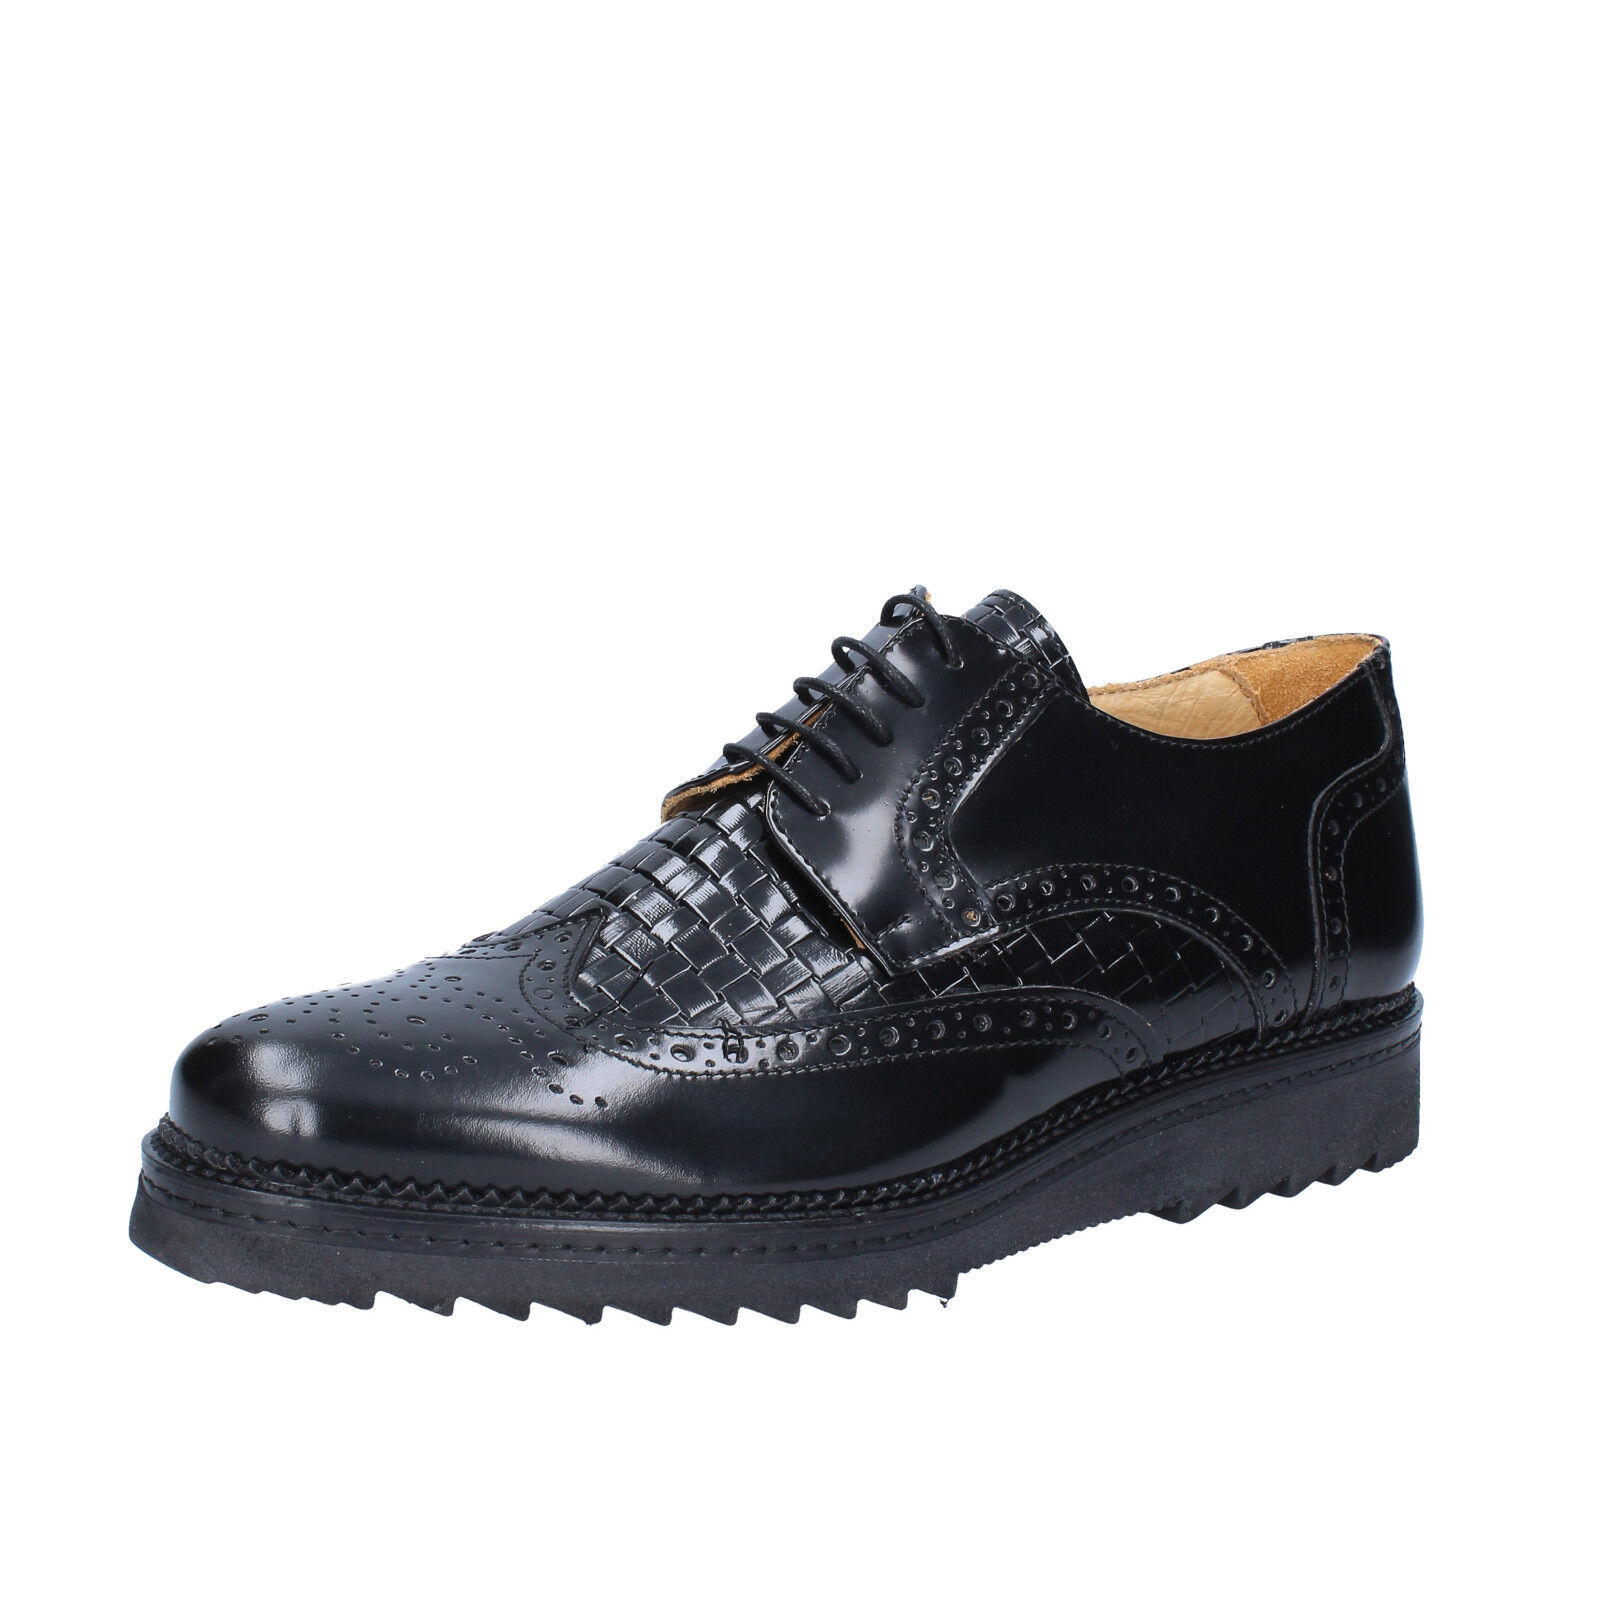 Men's shoes SALVO BARONE 10 (EU 43 ) elegant black shiny leather BZ147-E